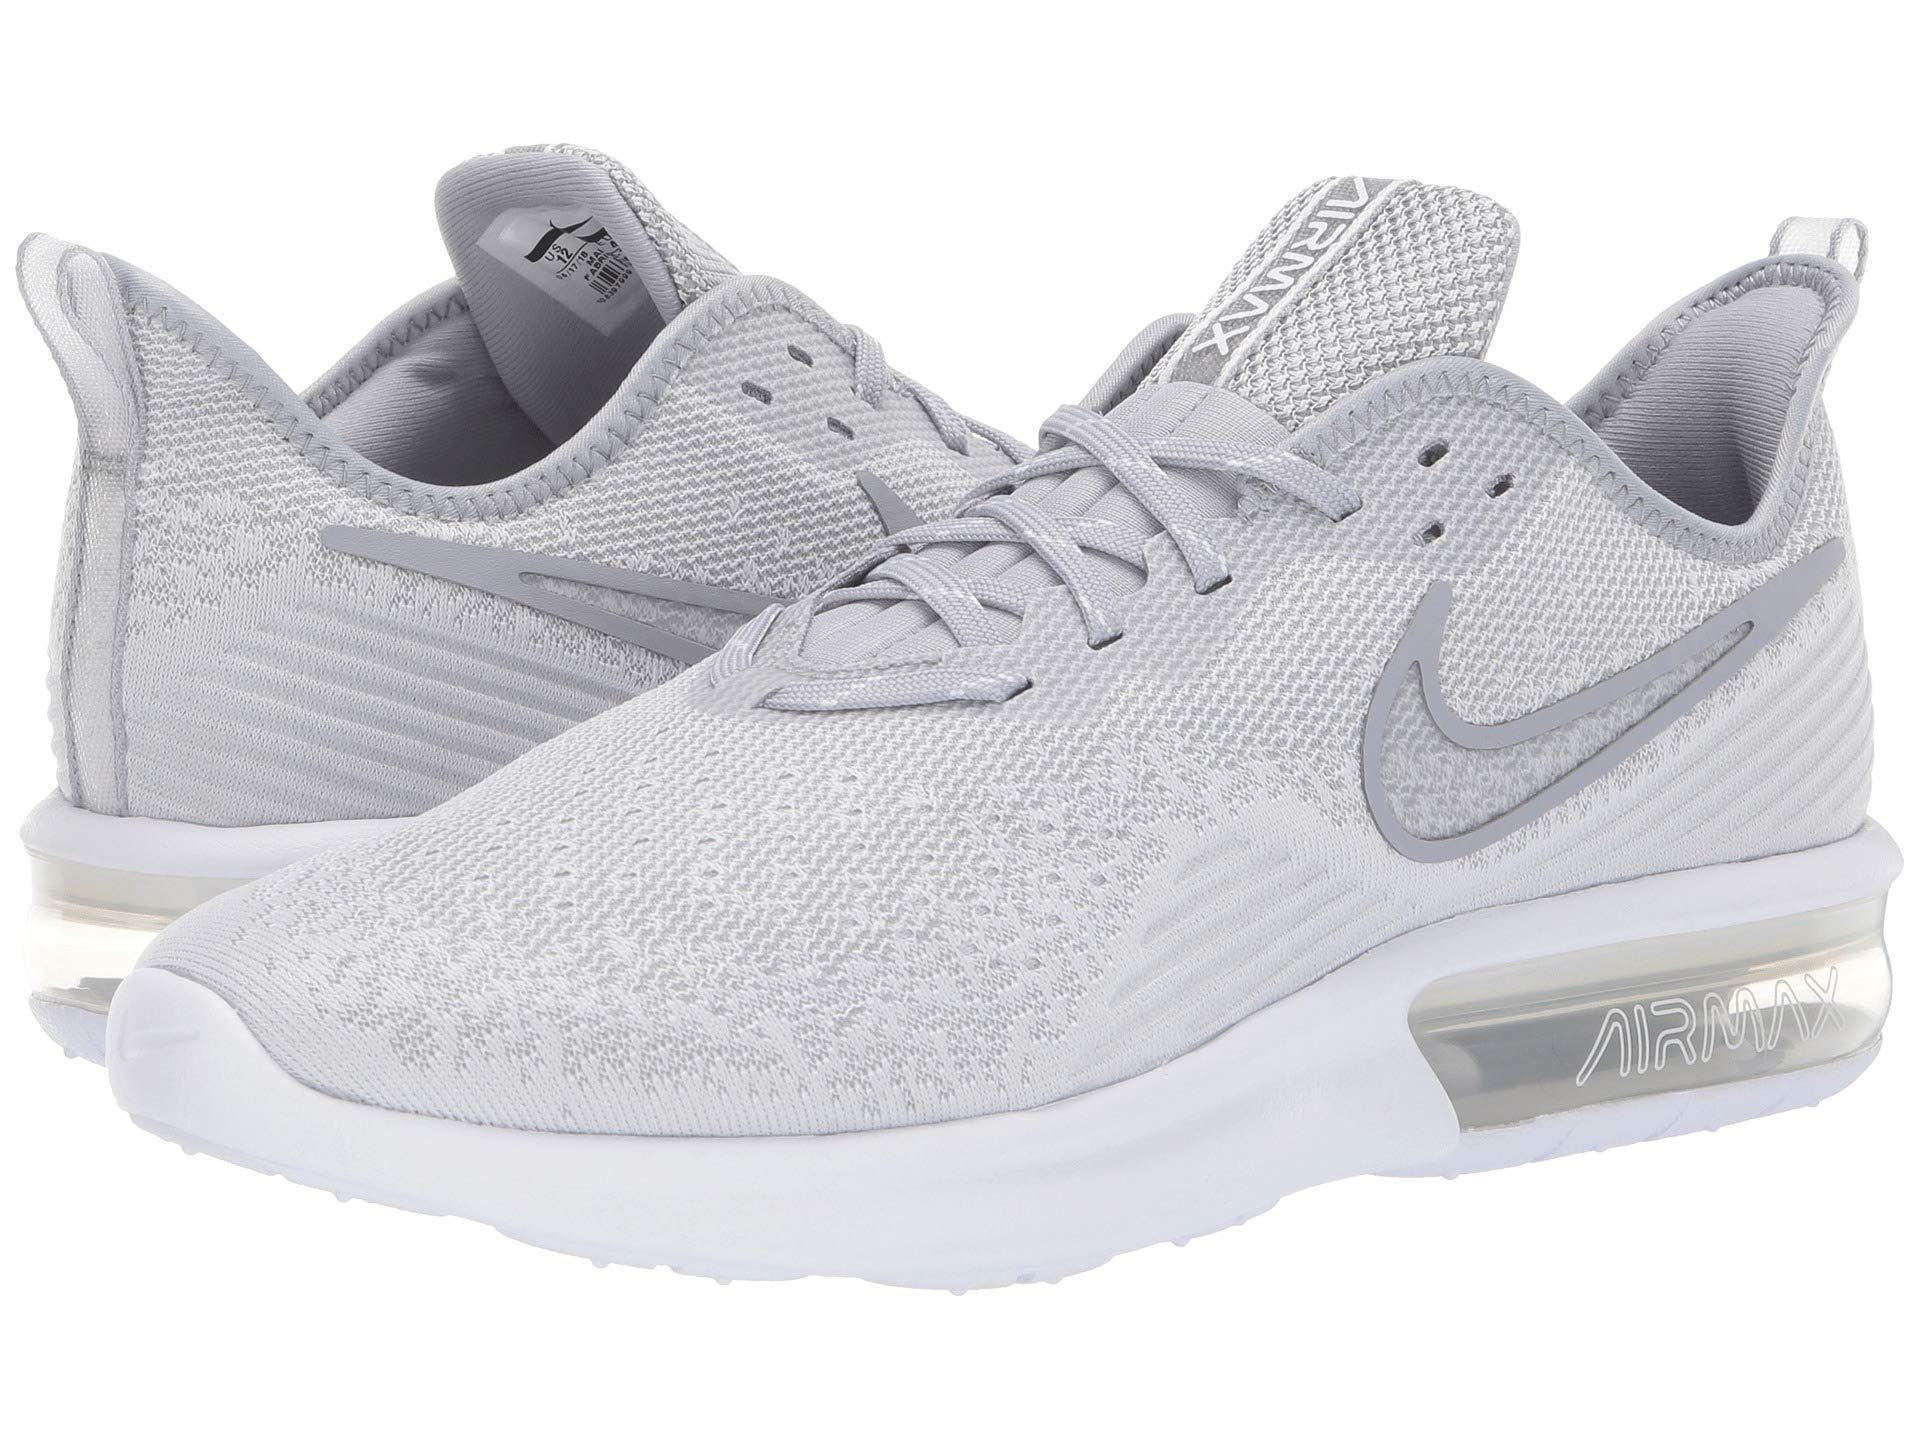 reputable site 317a6 9de1f Nike. White Air Max Sequent ...